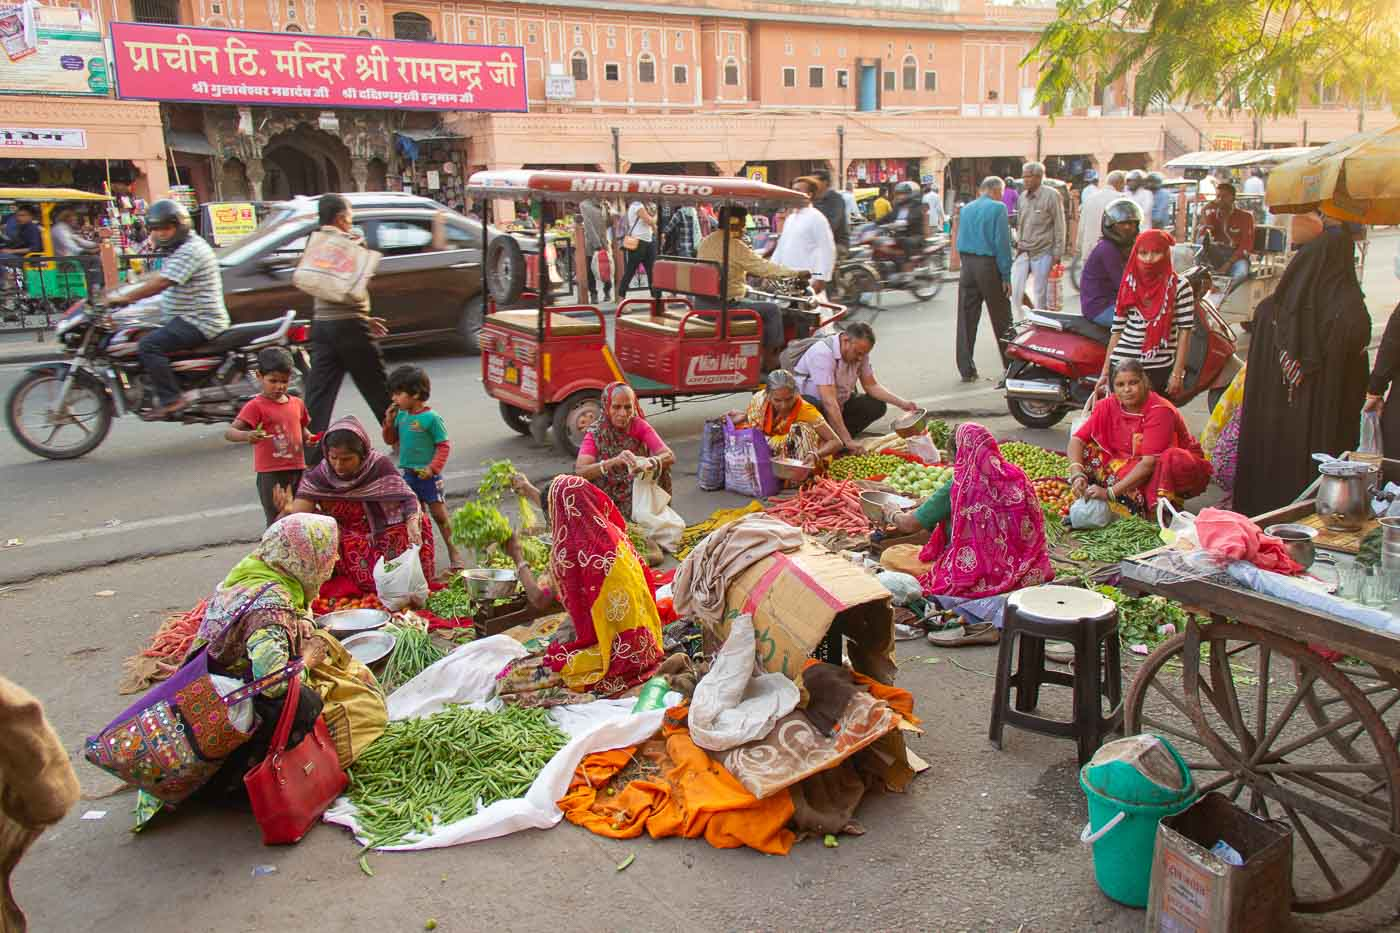 PinkCompass_Indien_Neu-Delhi_Marktfrauen